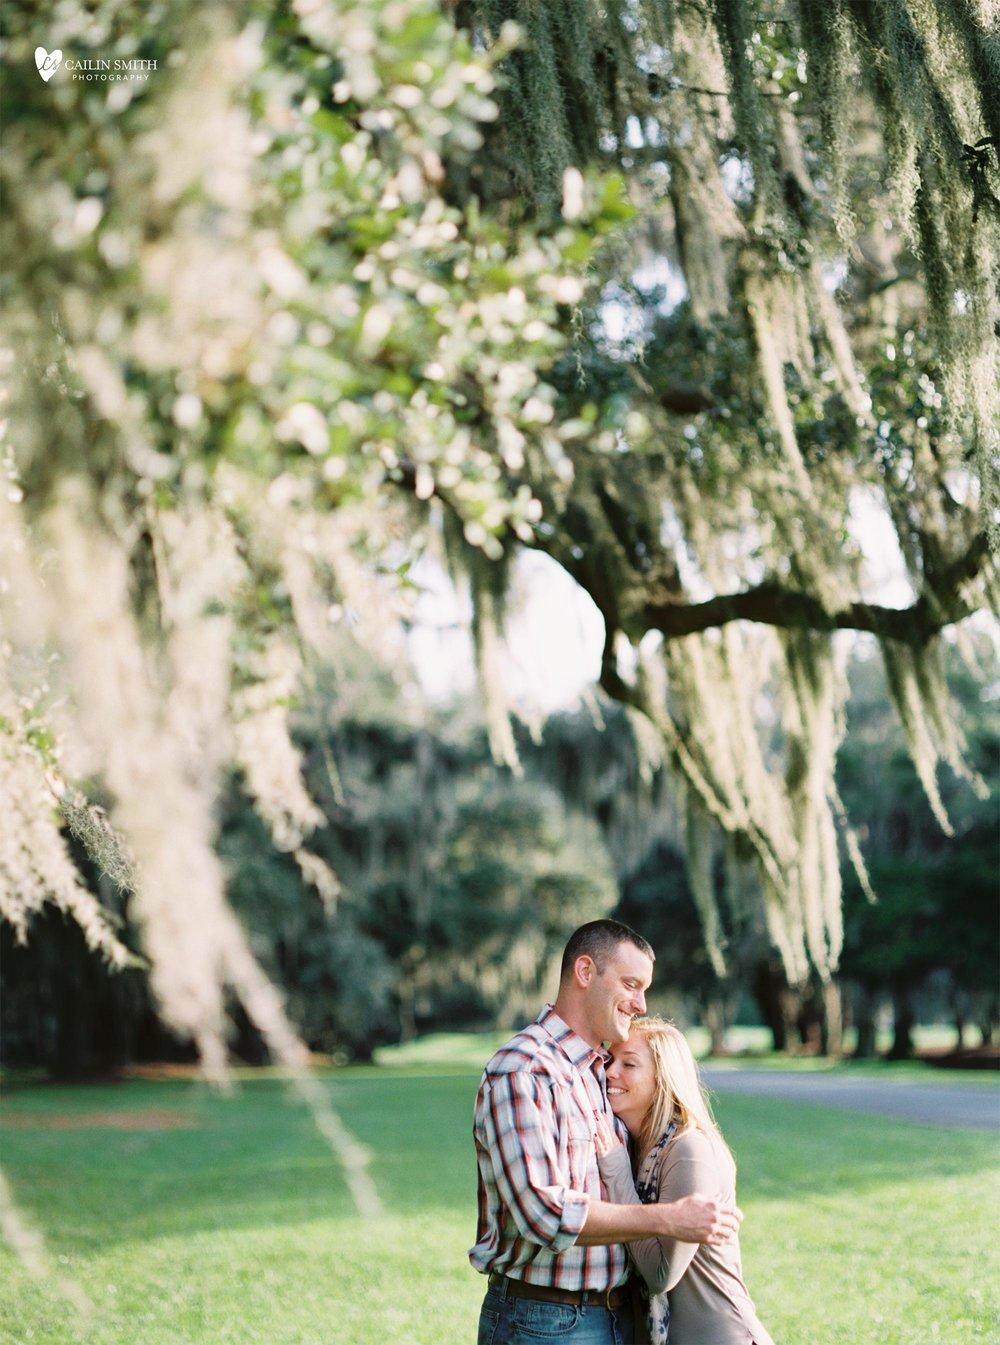 Sarah_Justin_Saint_Simons_Island_Engagement_Photography_019.jpg